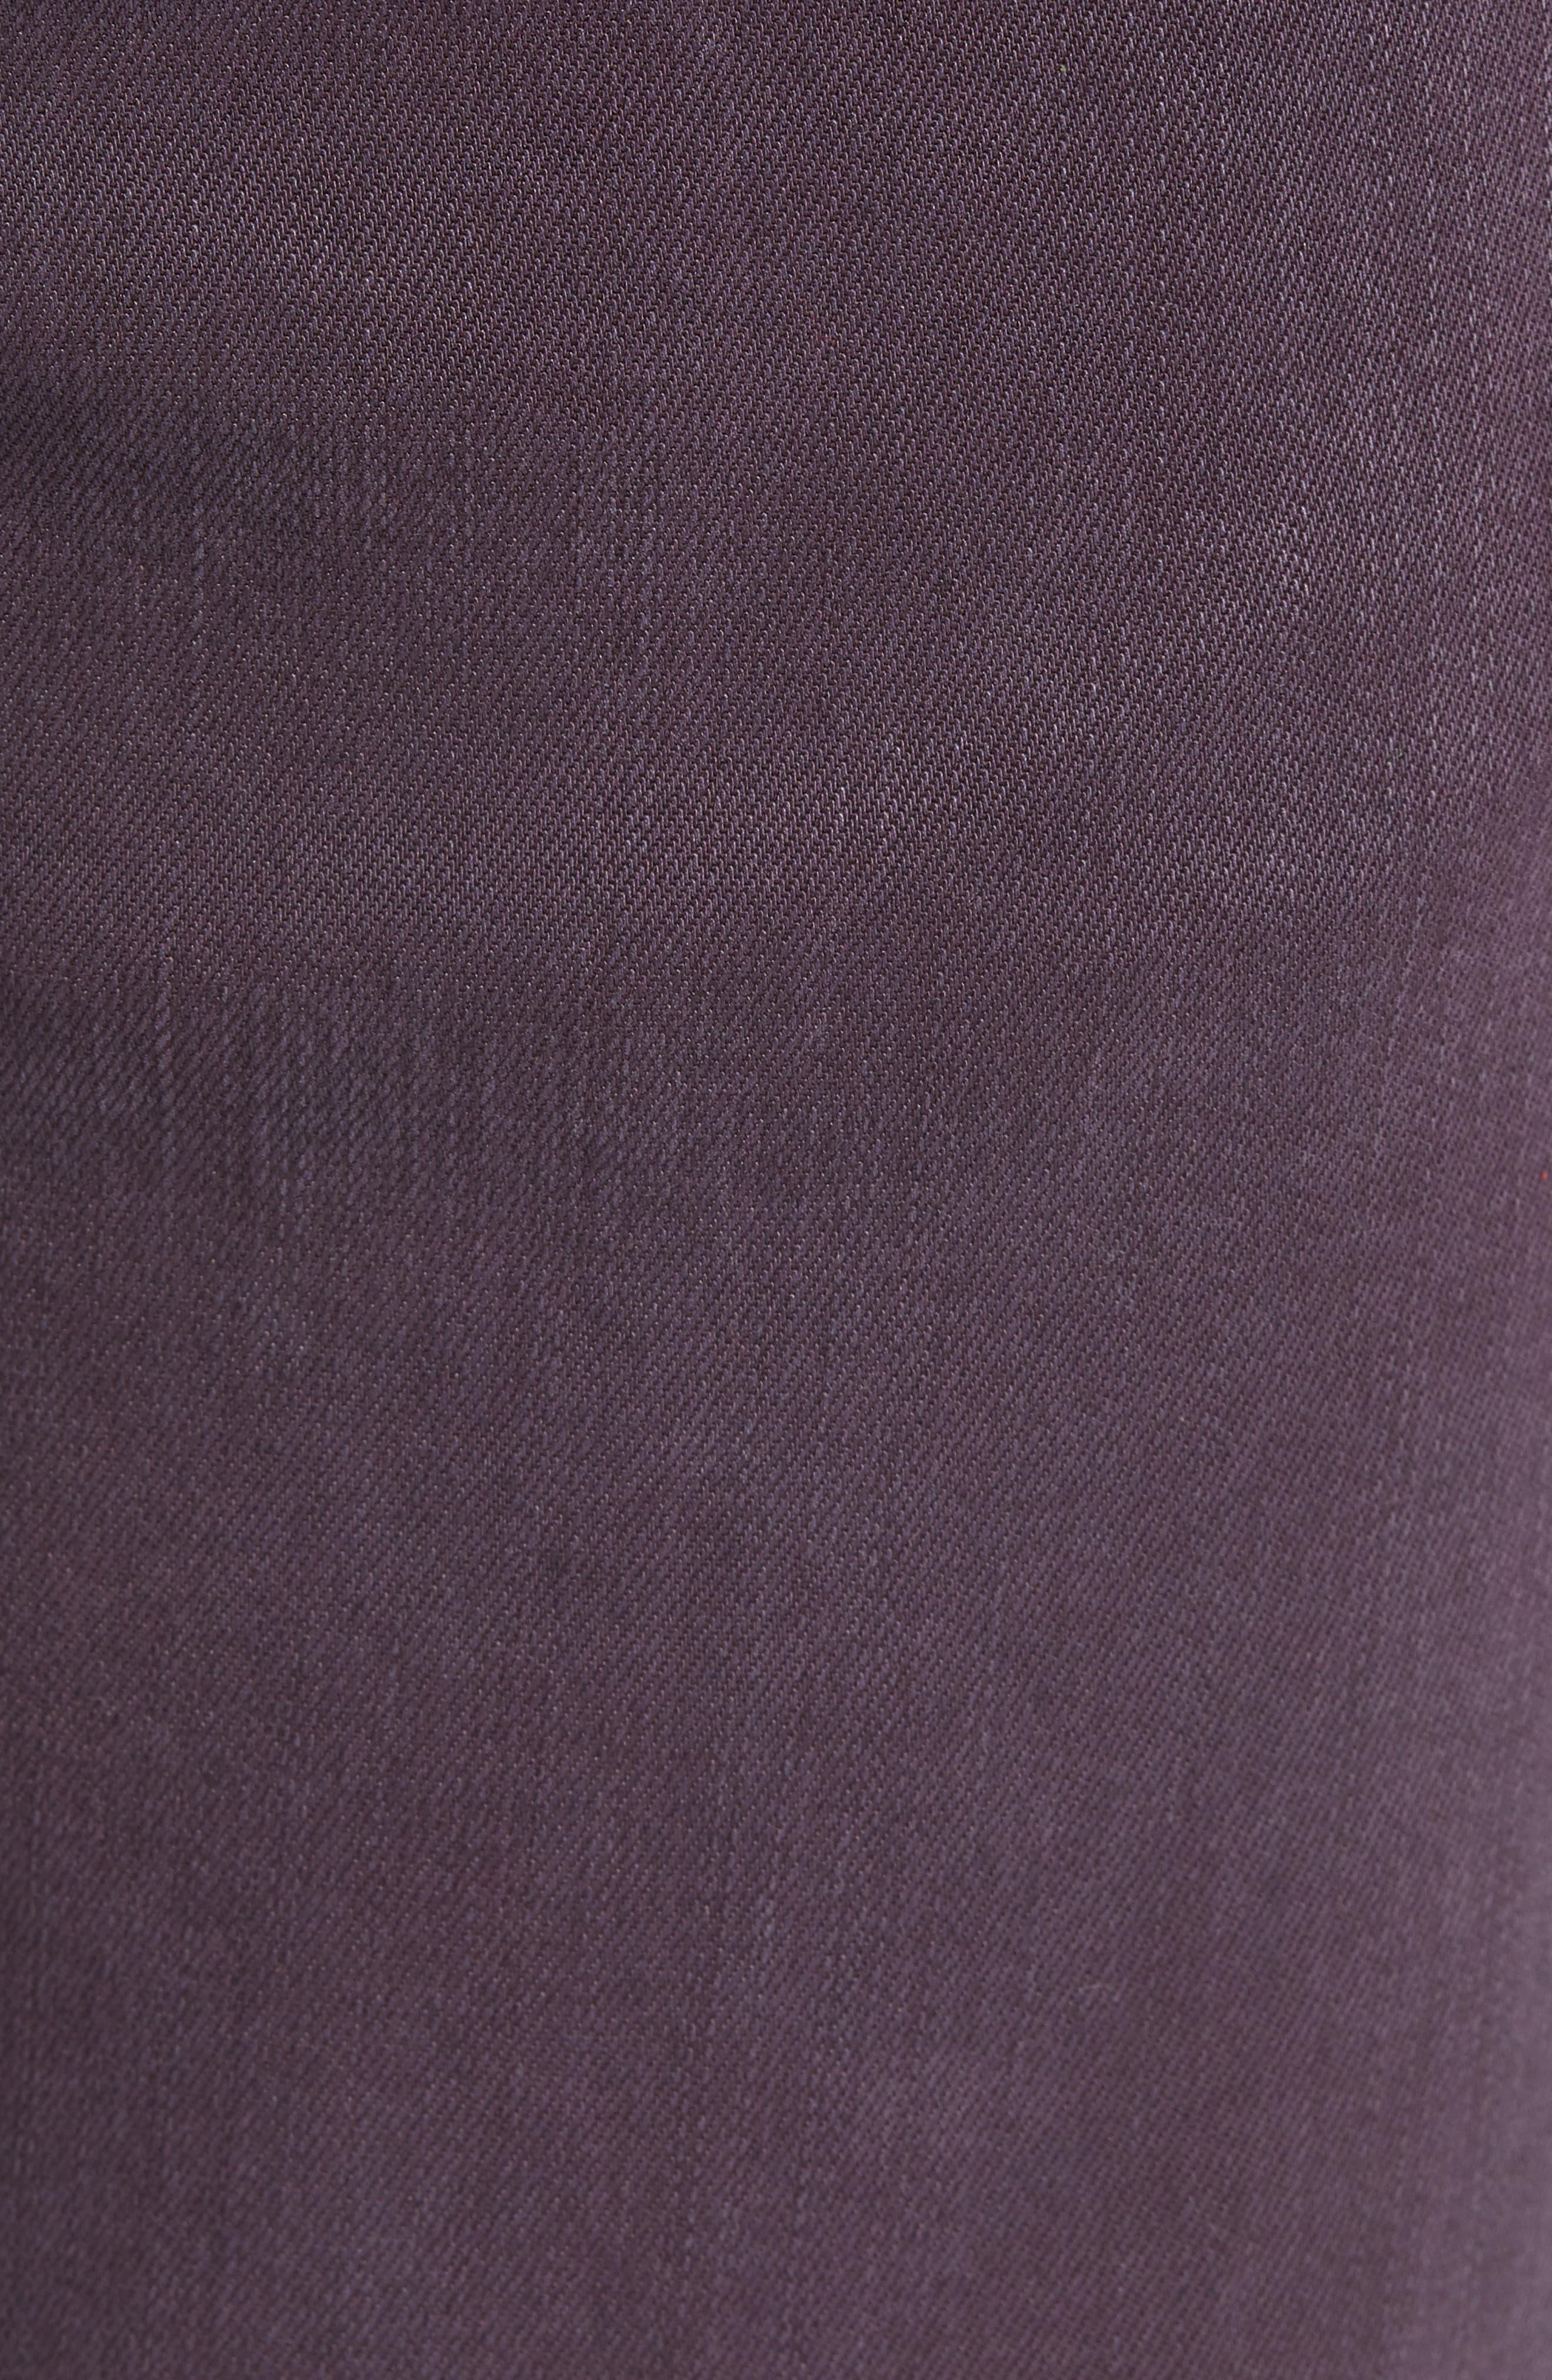 Jimmy Slim Straight Leg Jeans,                             Alternate thumbnail 5, color,                             600